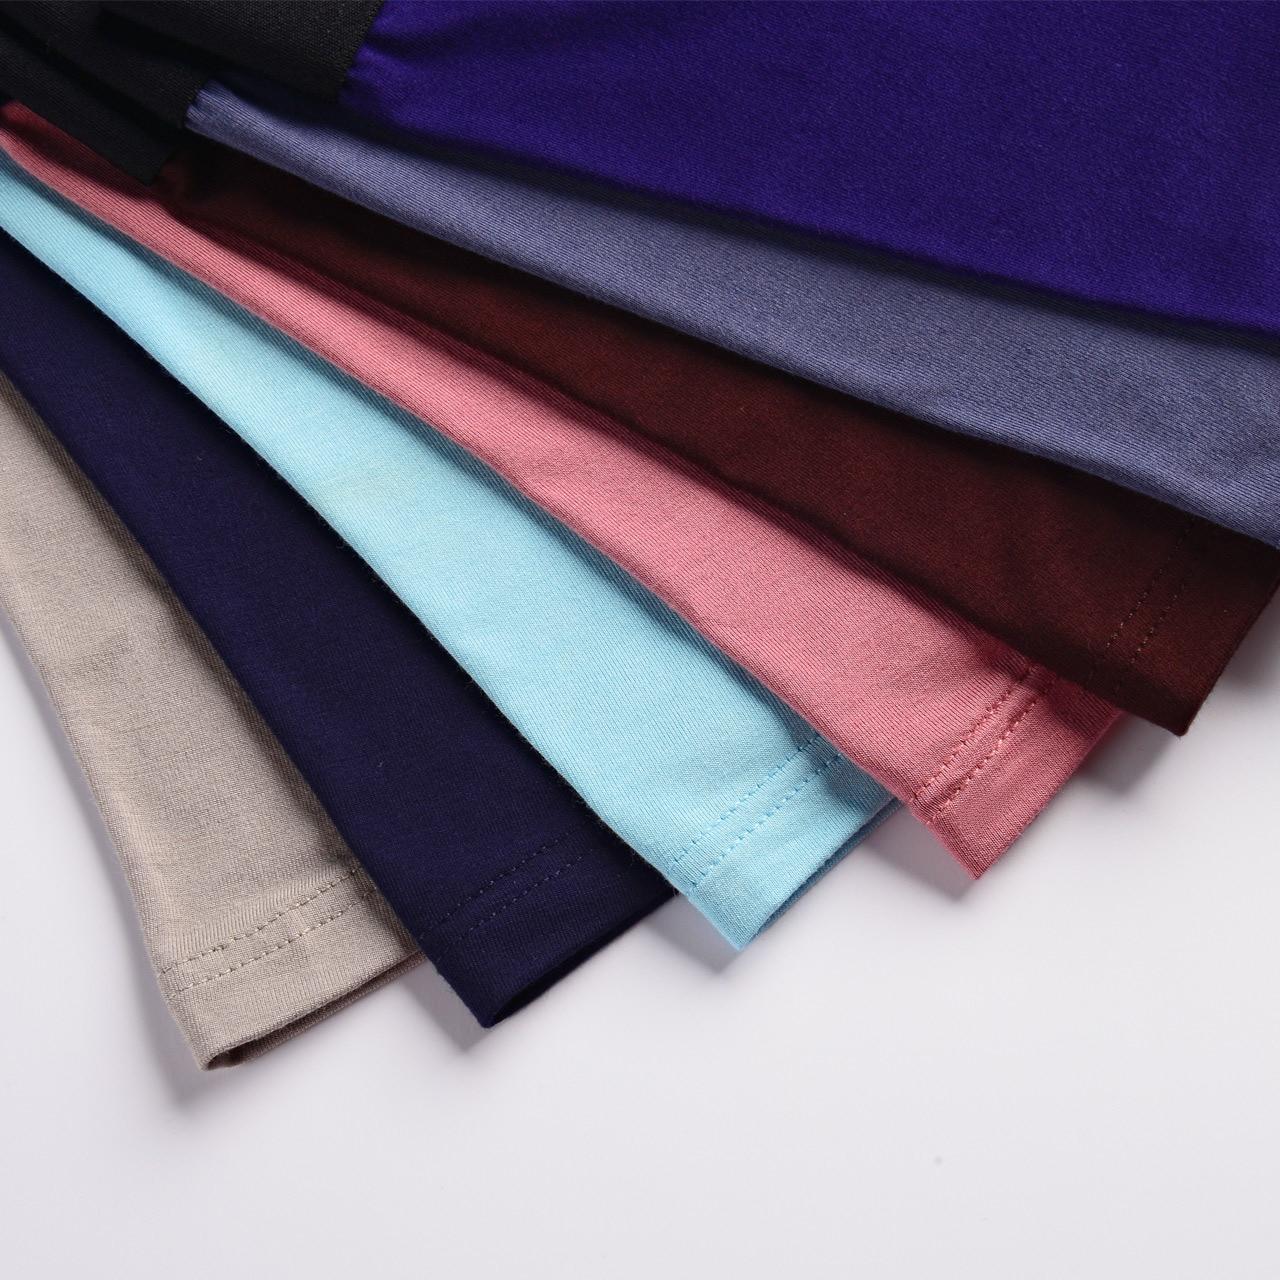 Men's Mid-Waist Knit Solid Color Boxer Briefs New Large Size Men U Convex Design Underwear School Flat Feet 3D Men's Underwear